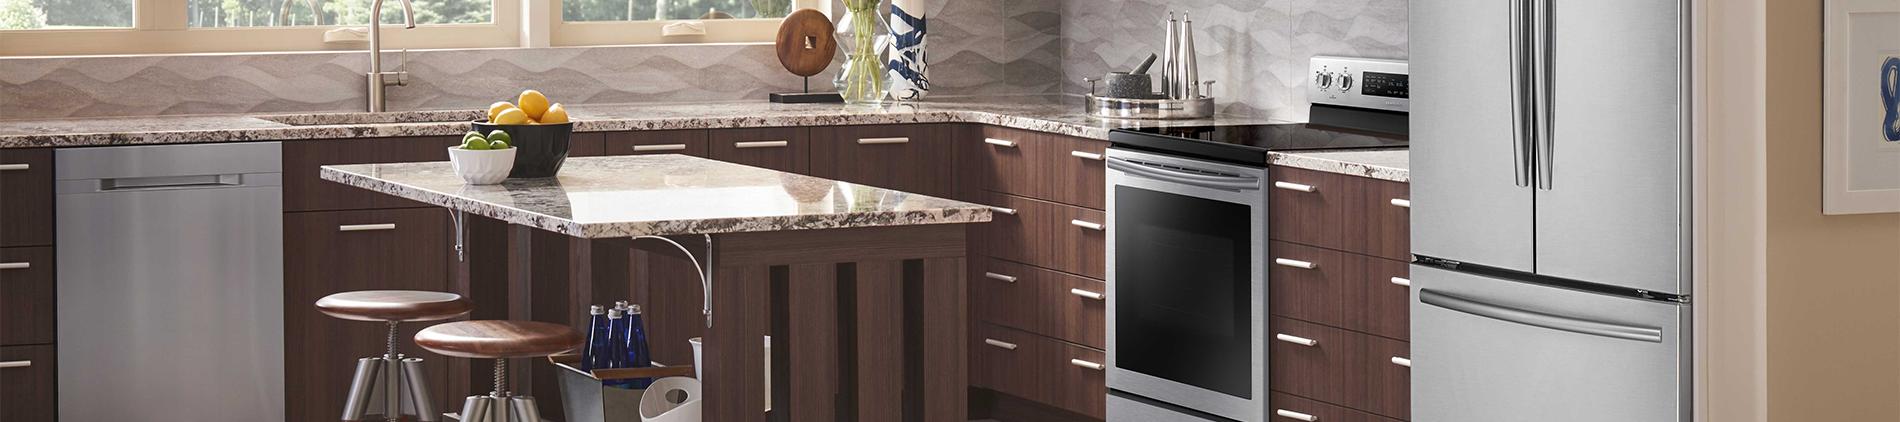 Samsung, Kitchen, Dishwasher, Stove, Fridge, Stool